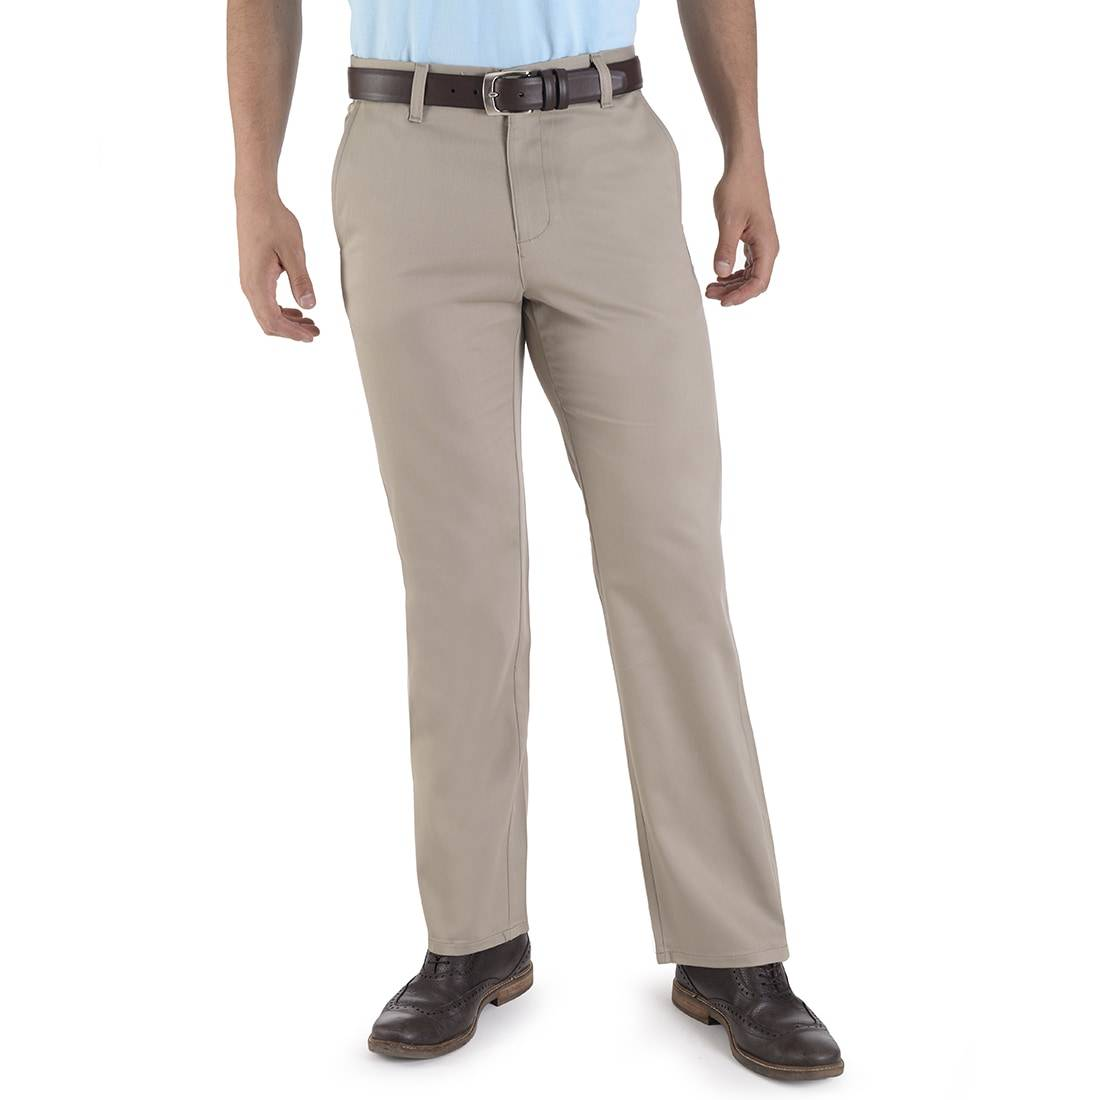 010789055267-01-Pantalon-Casual-Classic-Fit-Beige-yale